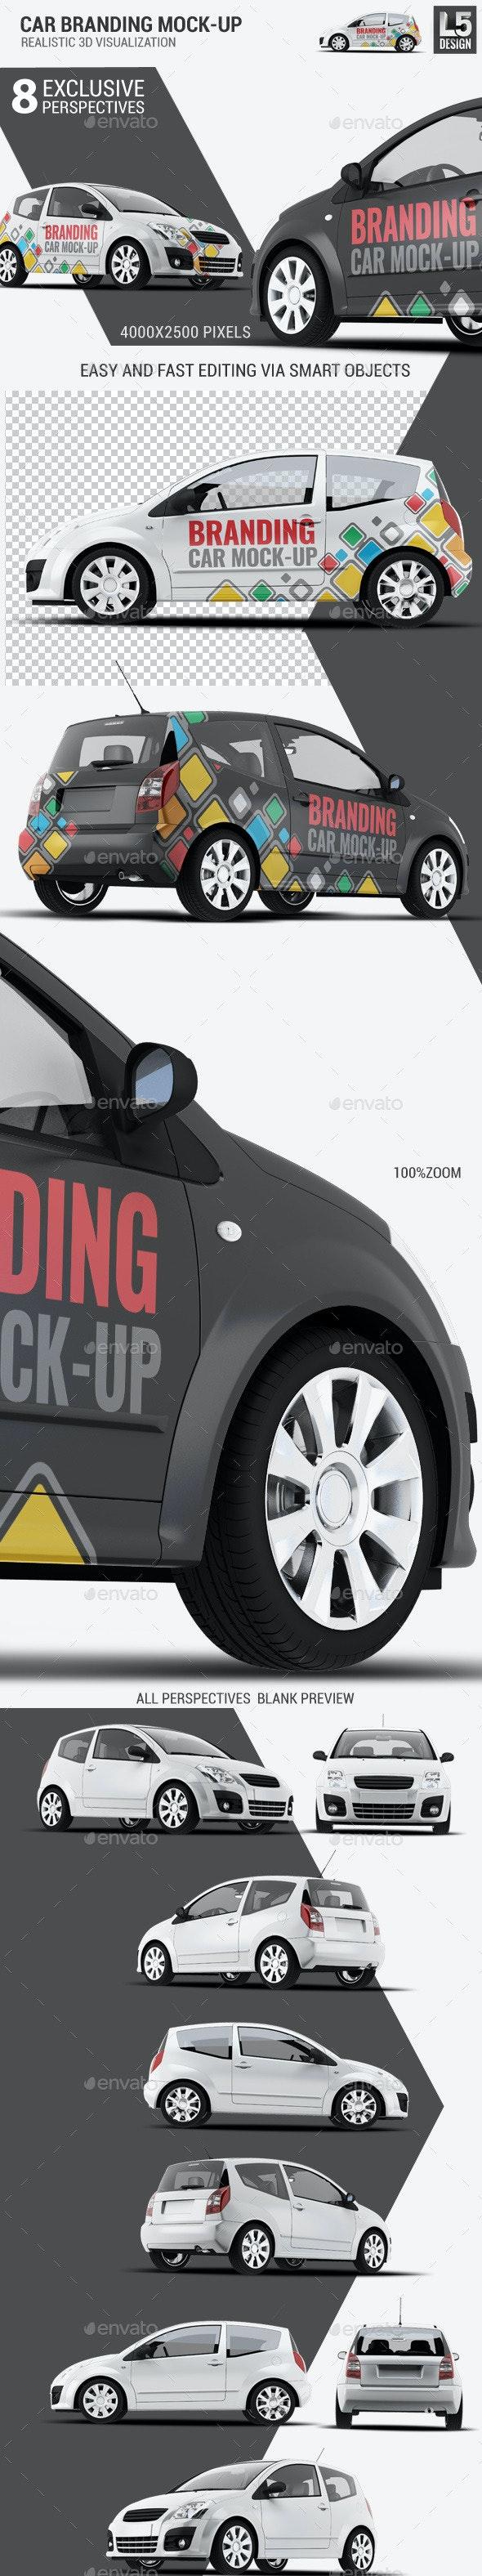 City Car Branding Mock-up - Vehicle Wraps Print